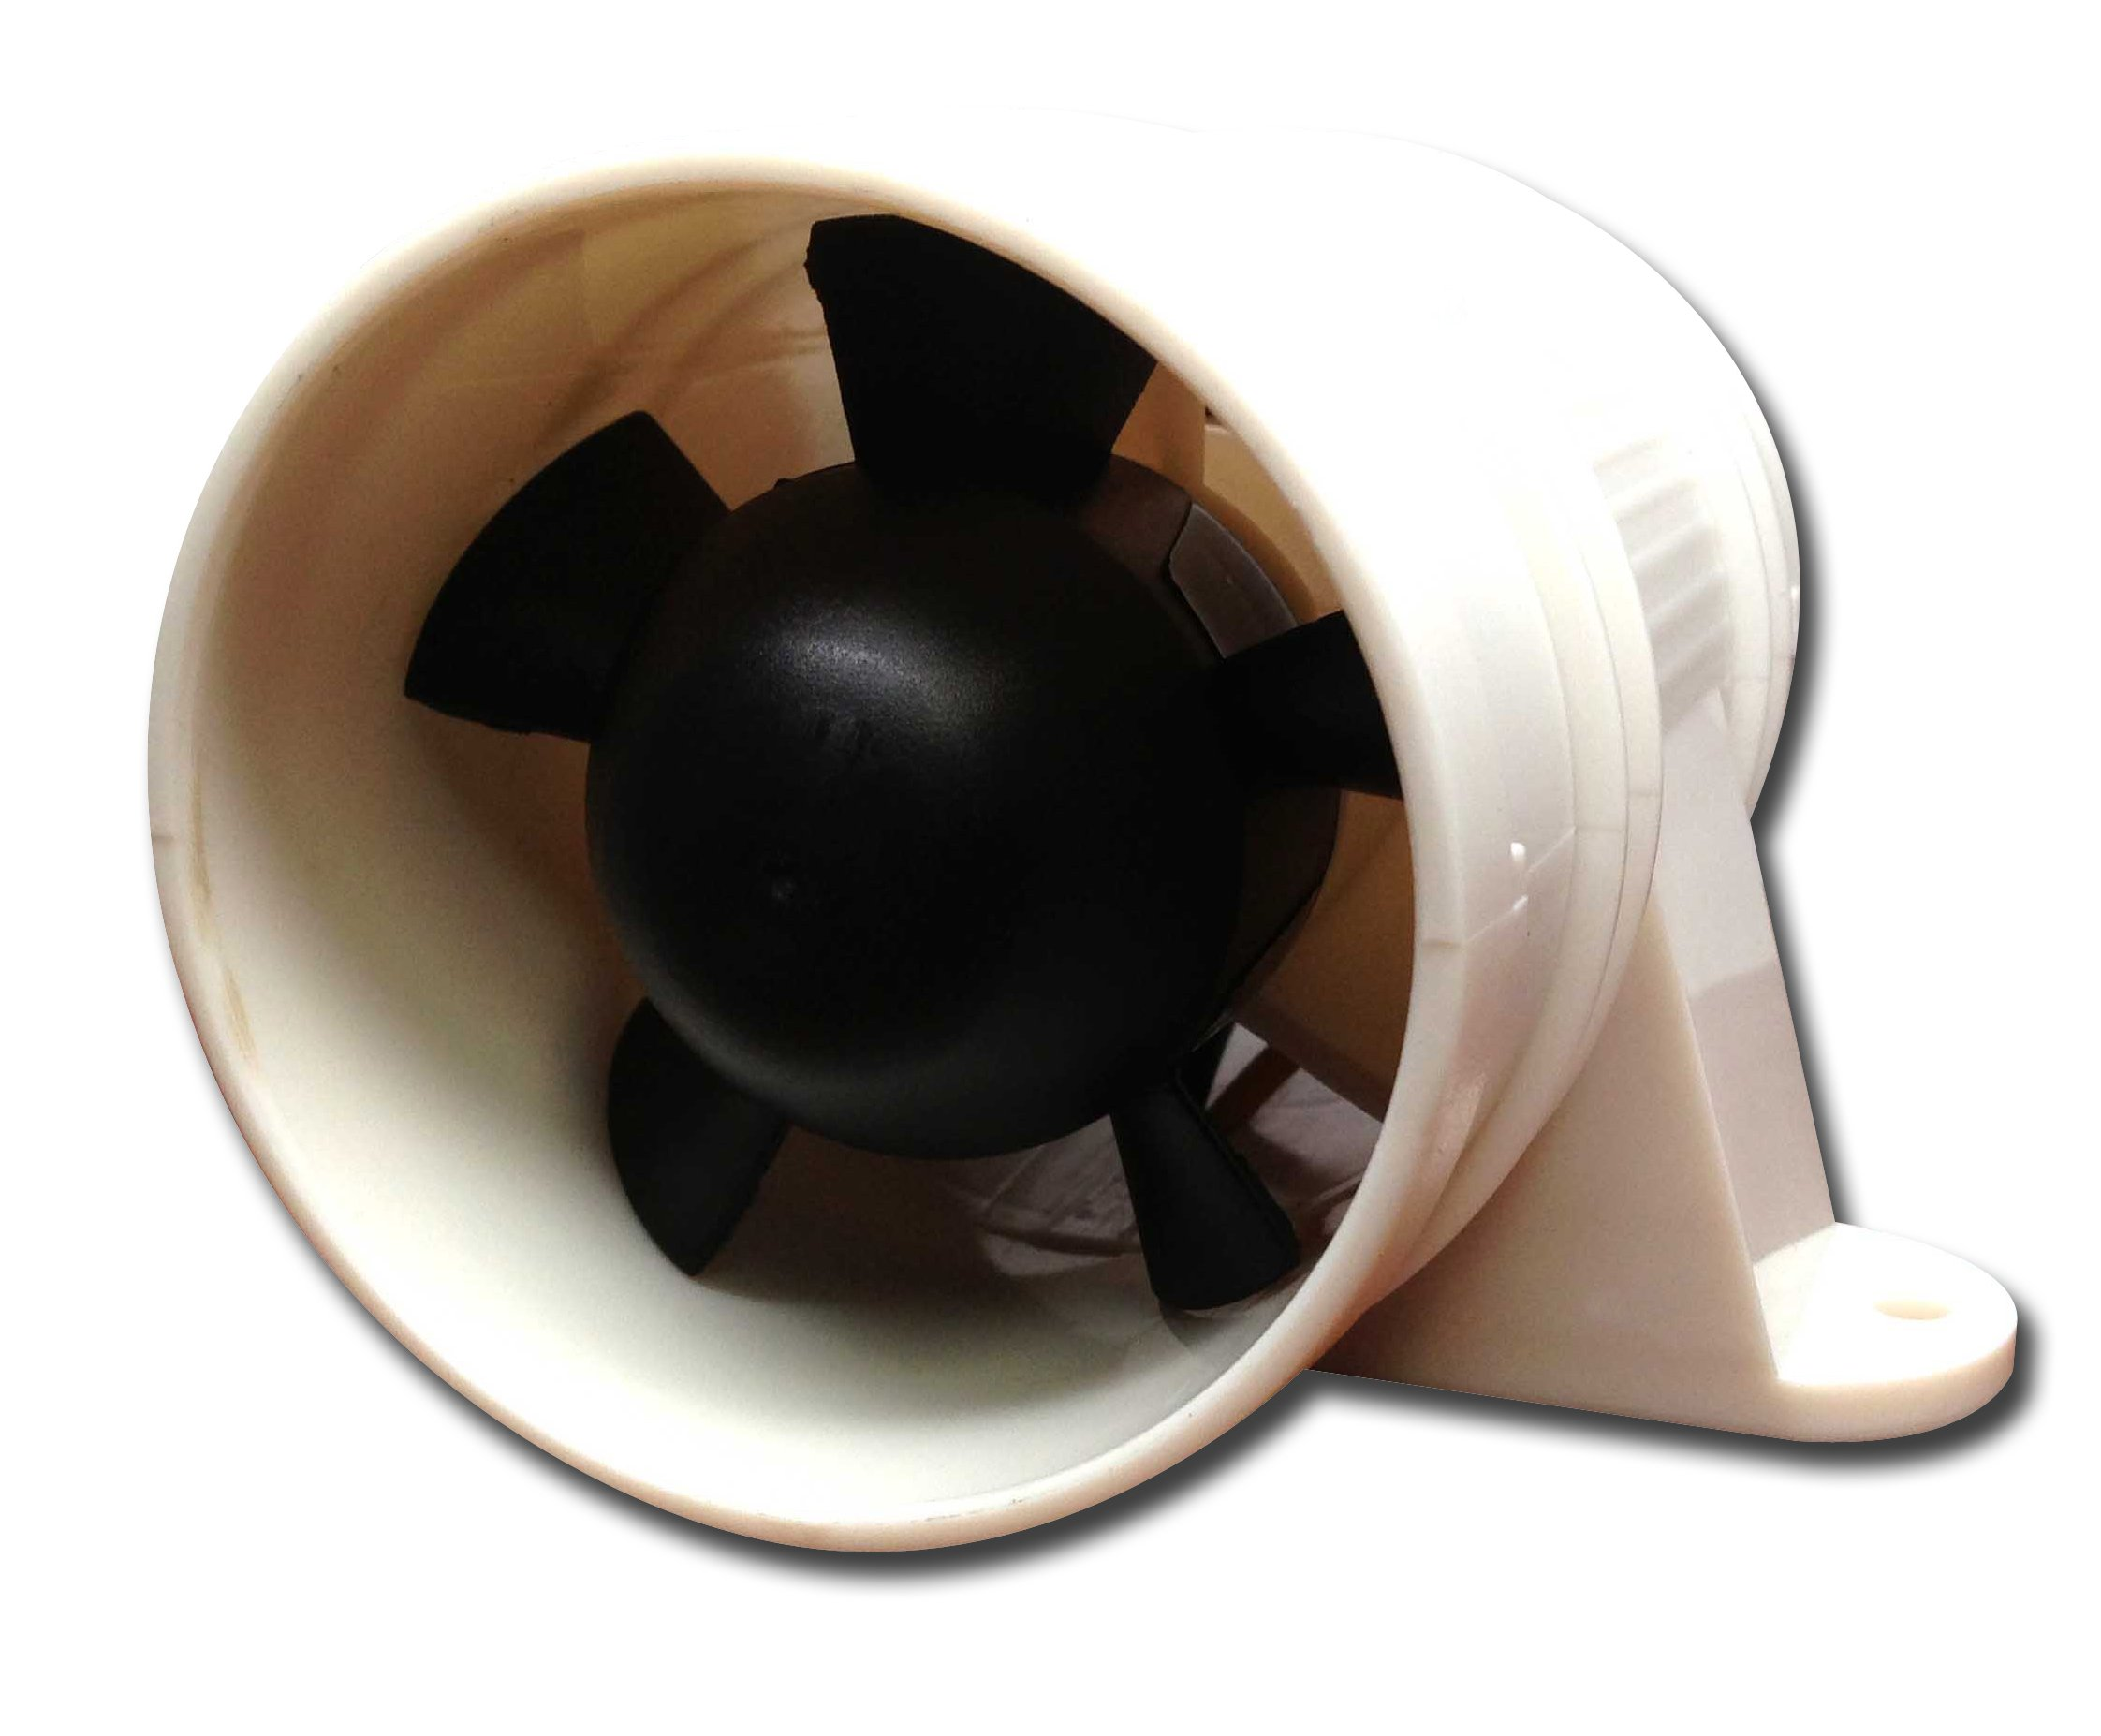 Pactrade Marine High Performance Turbo in Line Bilge Blower, 12V, White